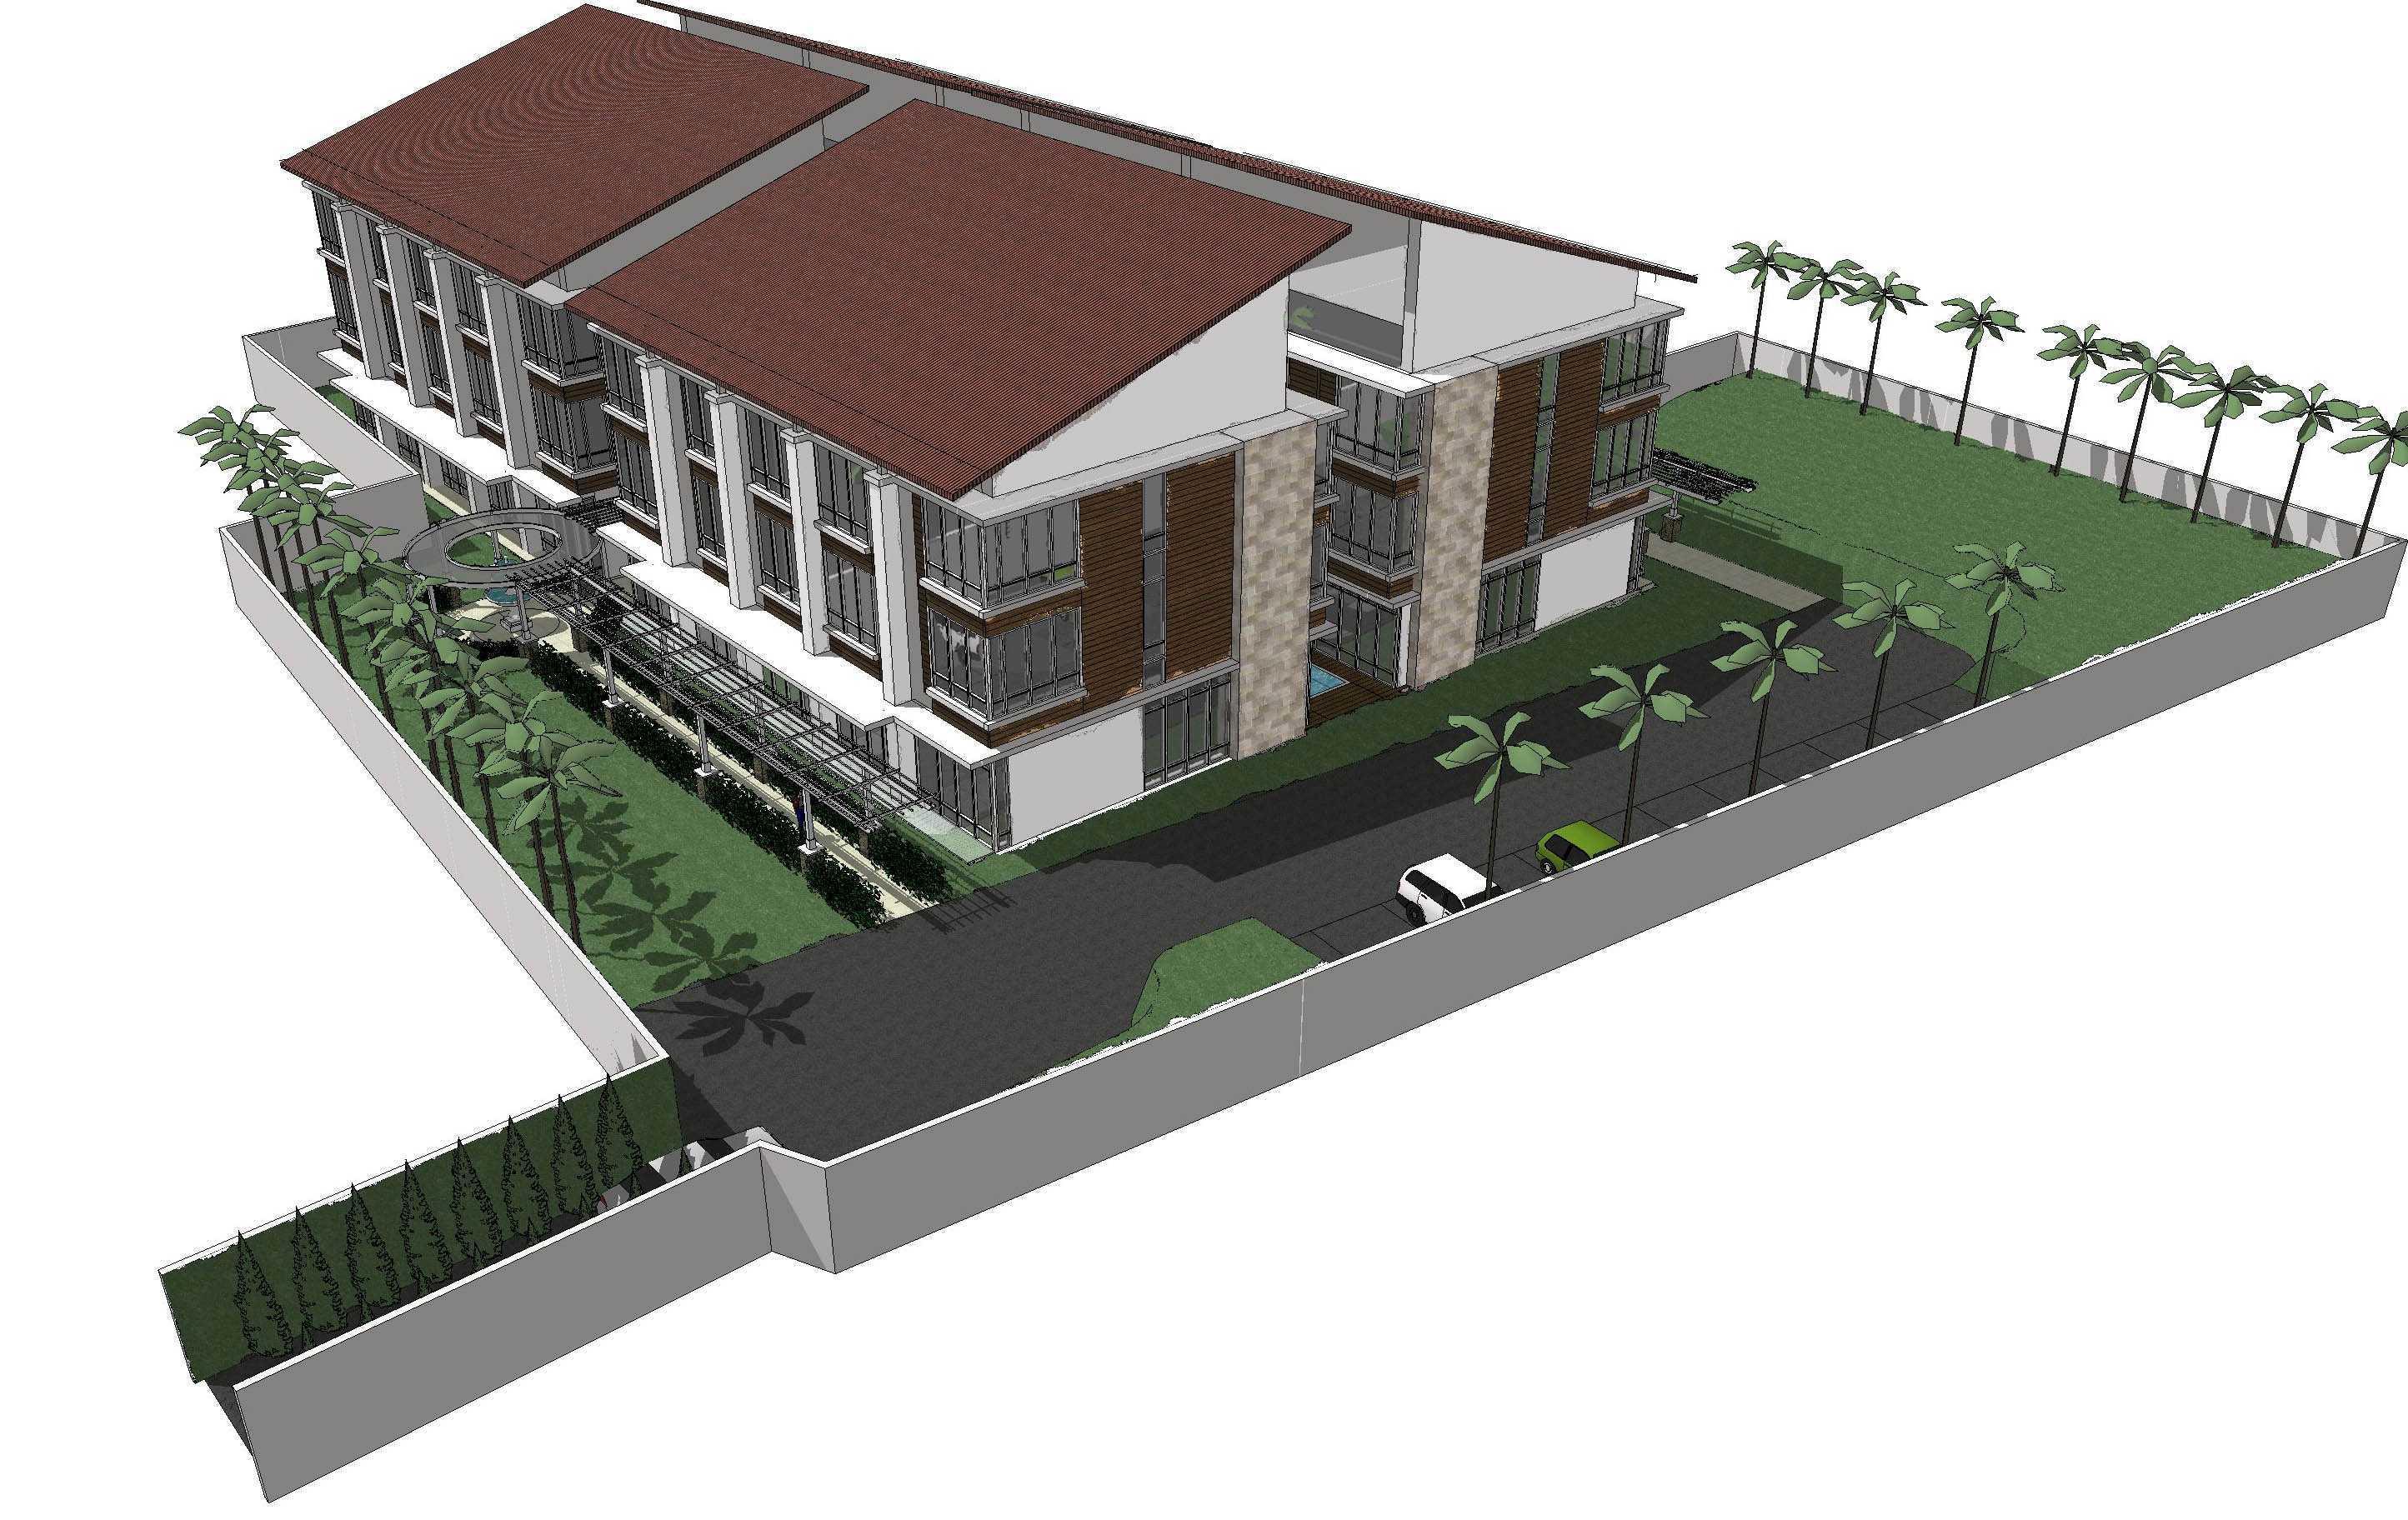 Arsigram Condotel For Healing Teraphy Daerah Khusus Ibukota Jakarta, Indonesia Daerah Khusus Ibukota Jakarta, Indonesia Exterior View Modern  43651